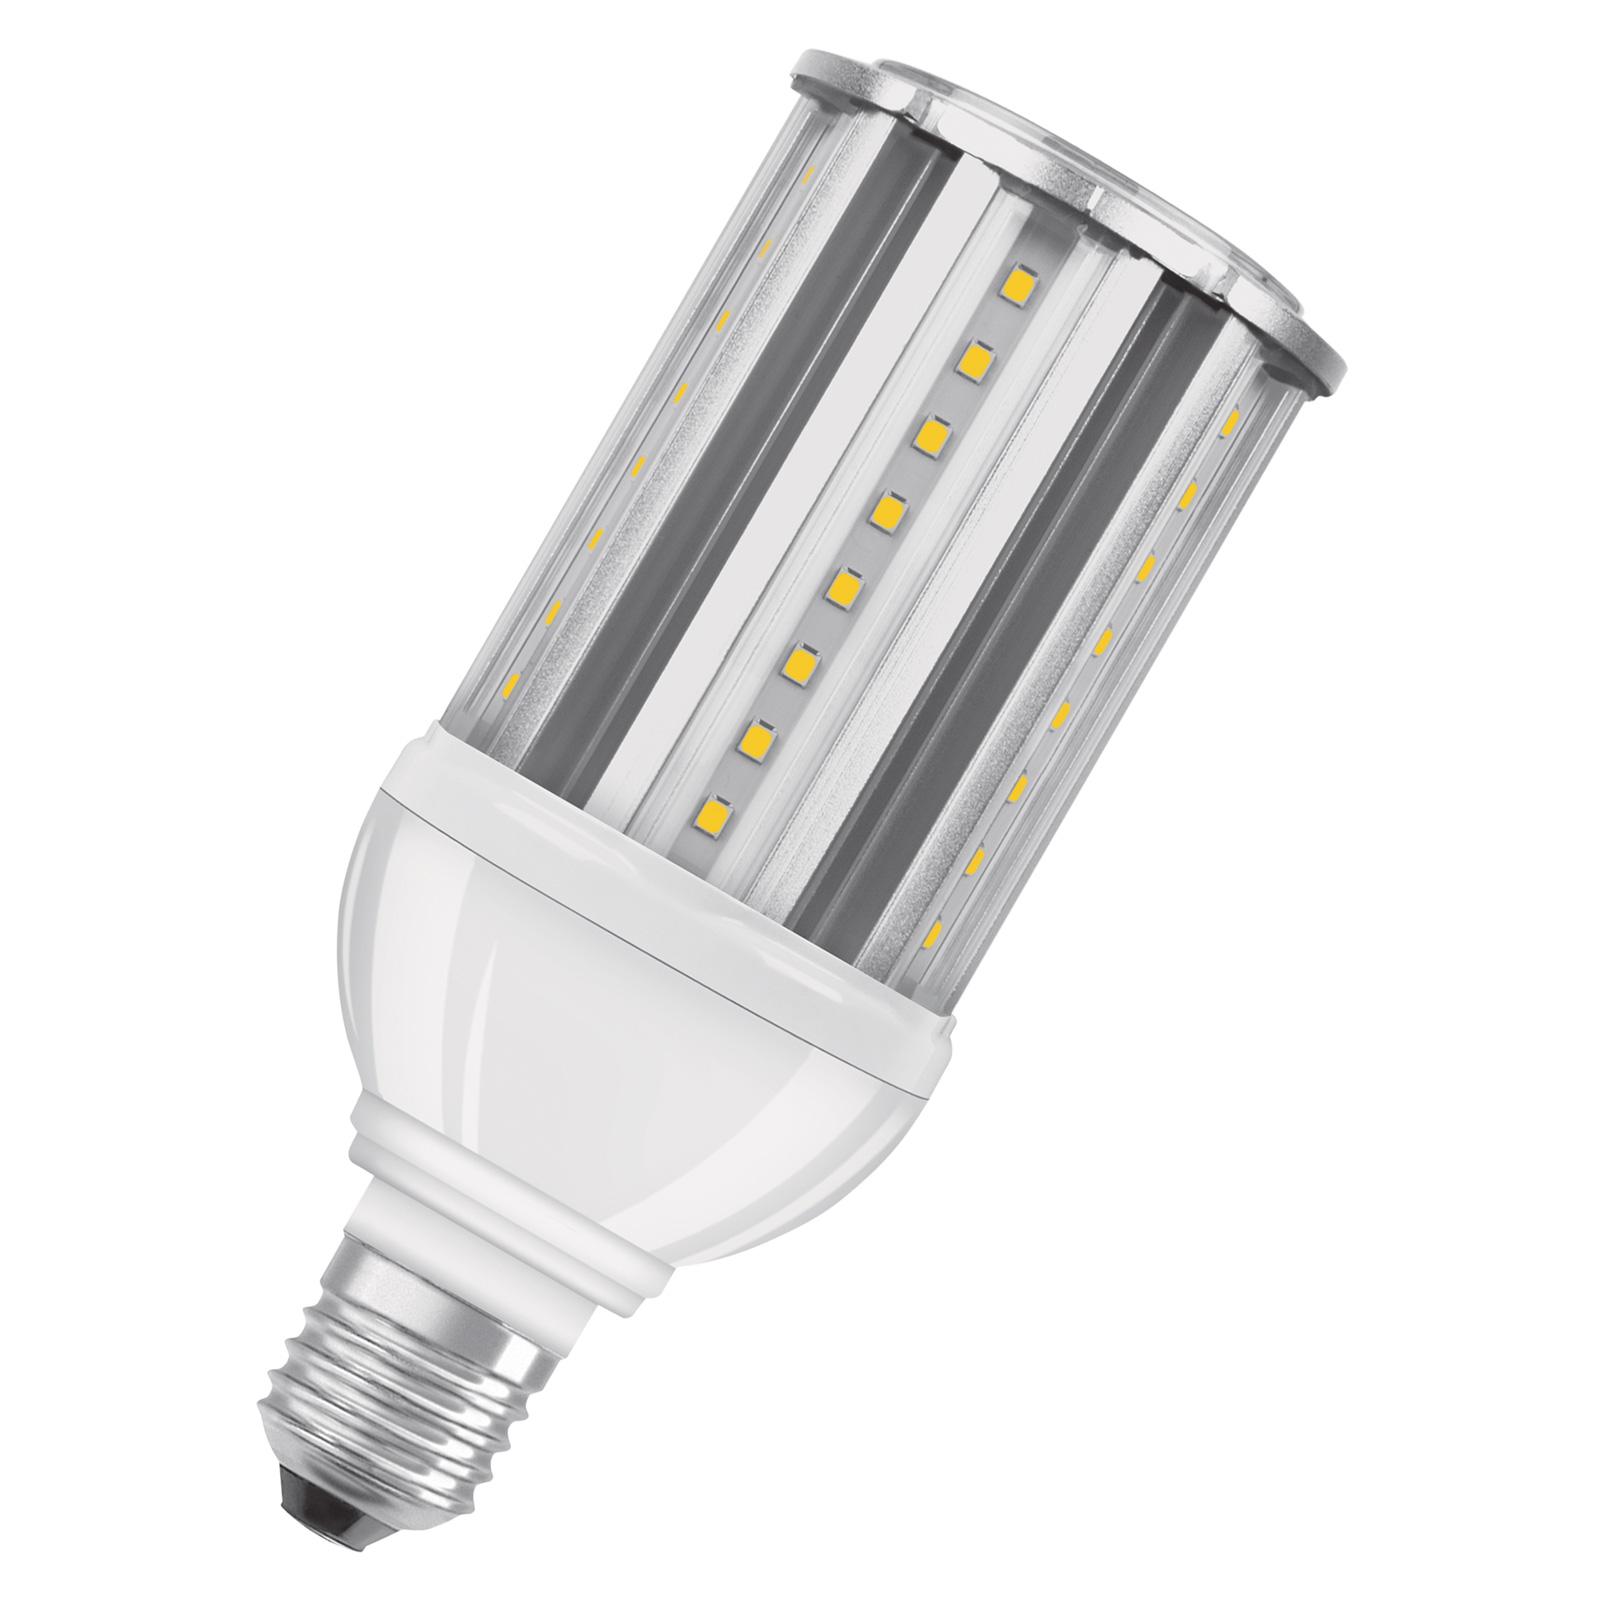 Osram parathom hql led lampe e27 18 watt 2000 lumen for Lampe 4000 kelvin